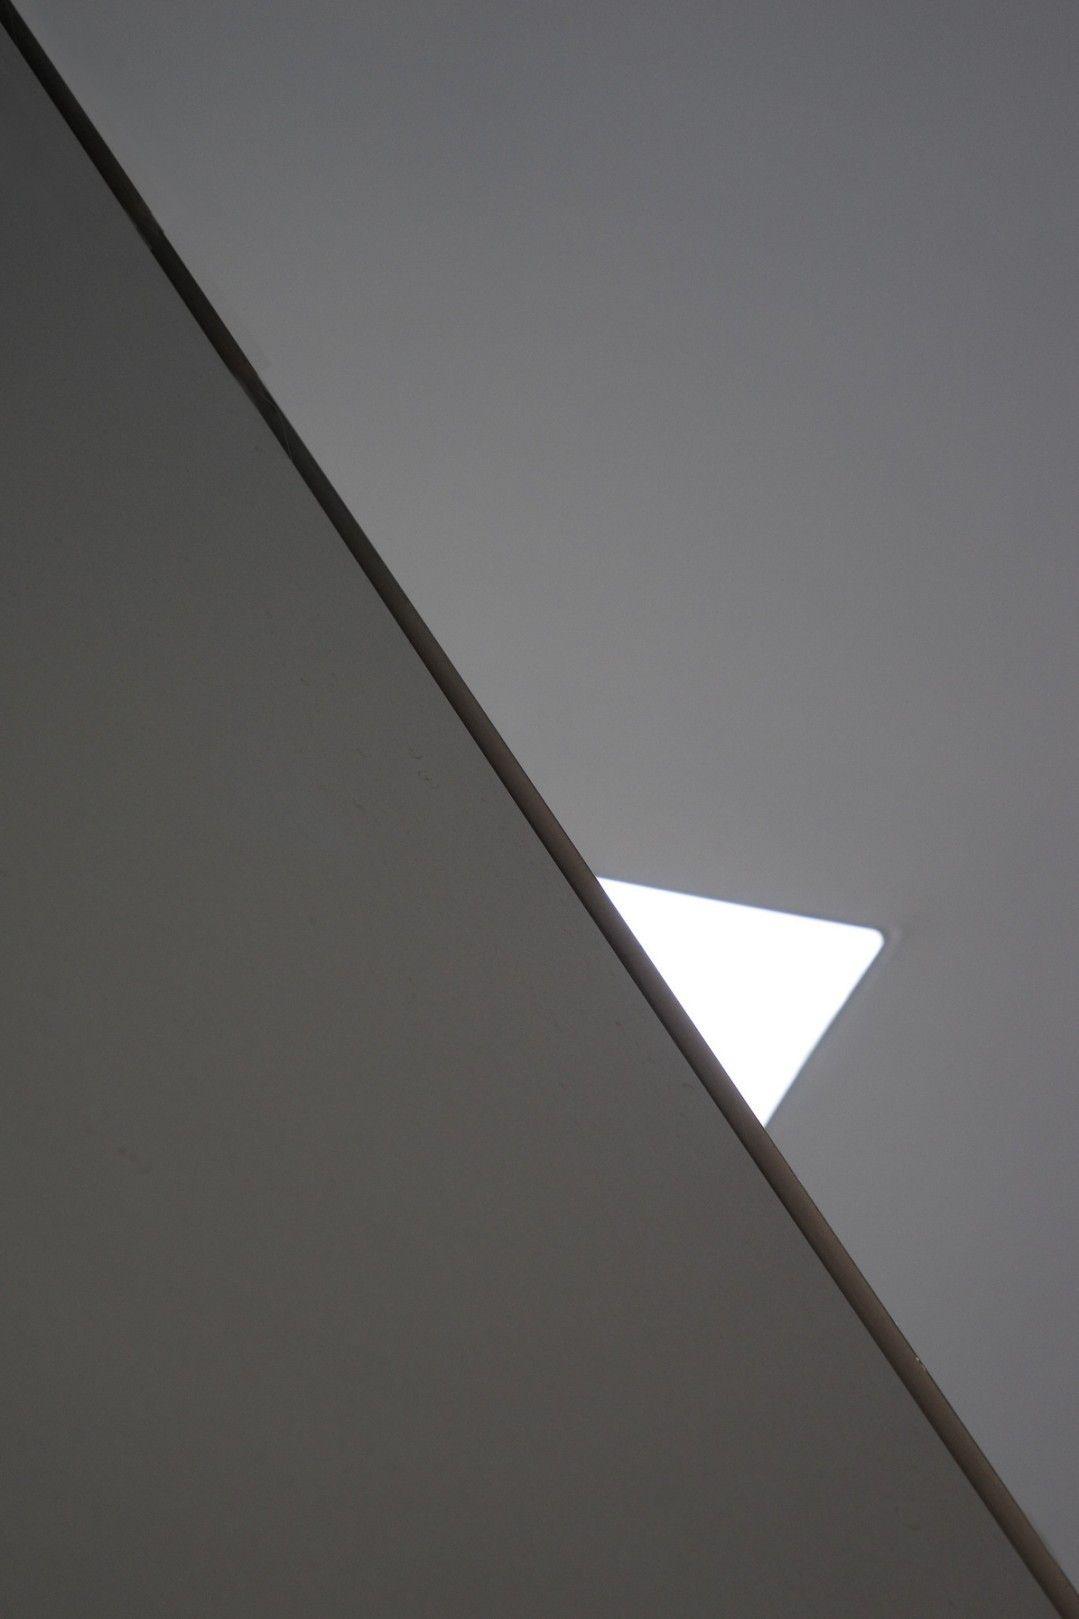 Corner Tip Of Skylight In 2020 Skylight Lamp Decor